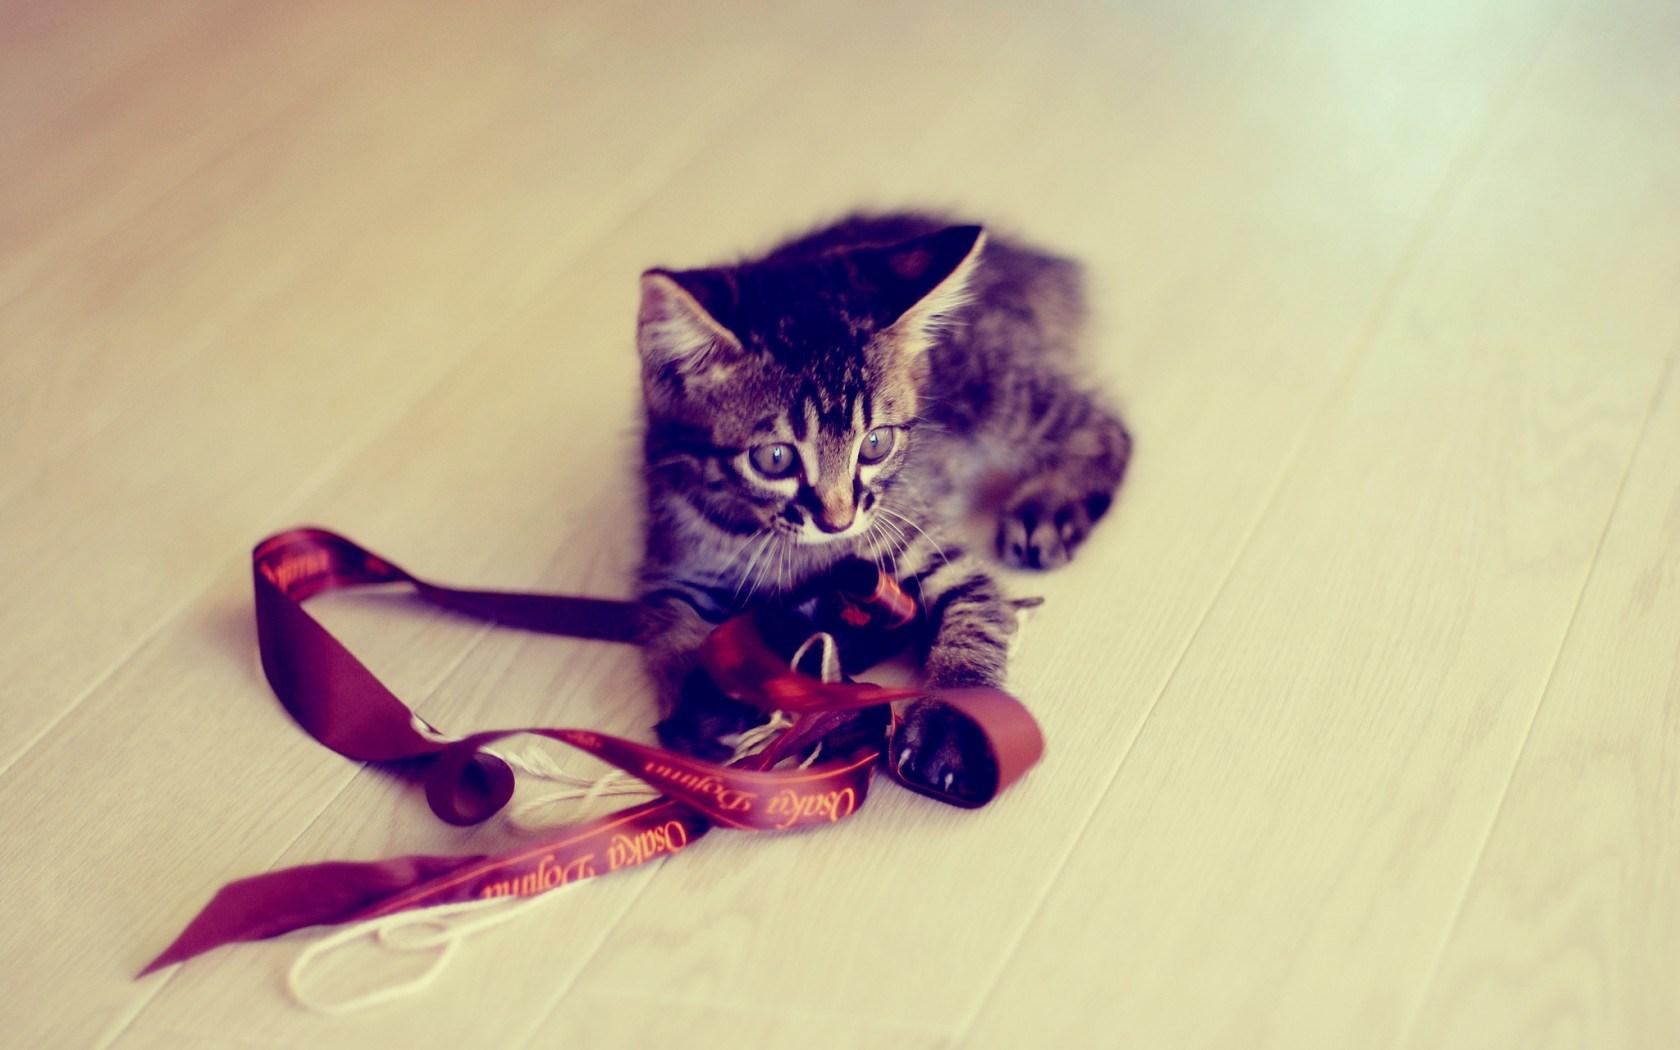 Kitten Tape Game